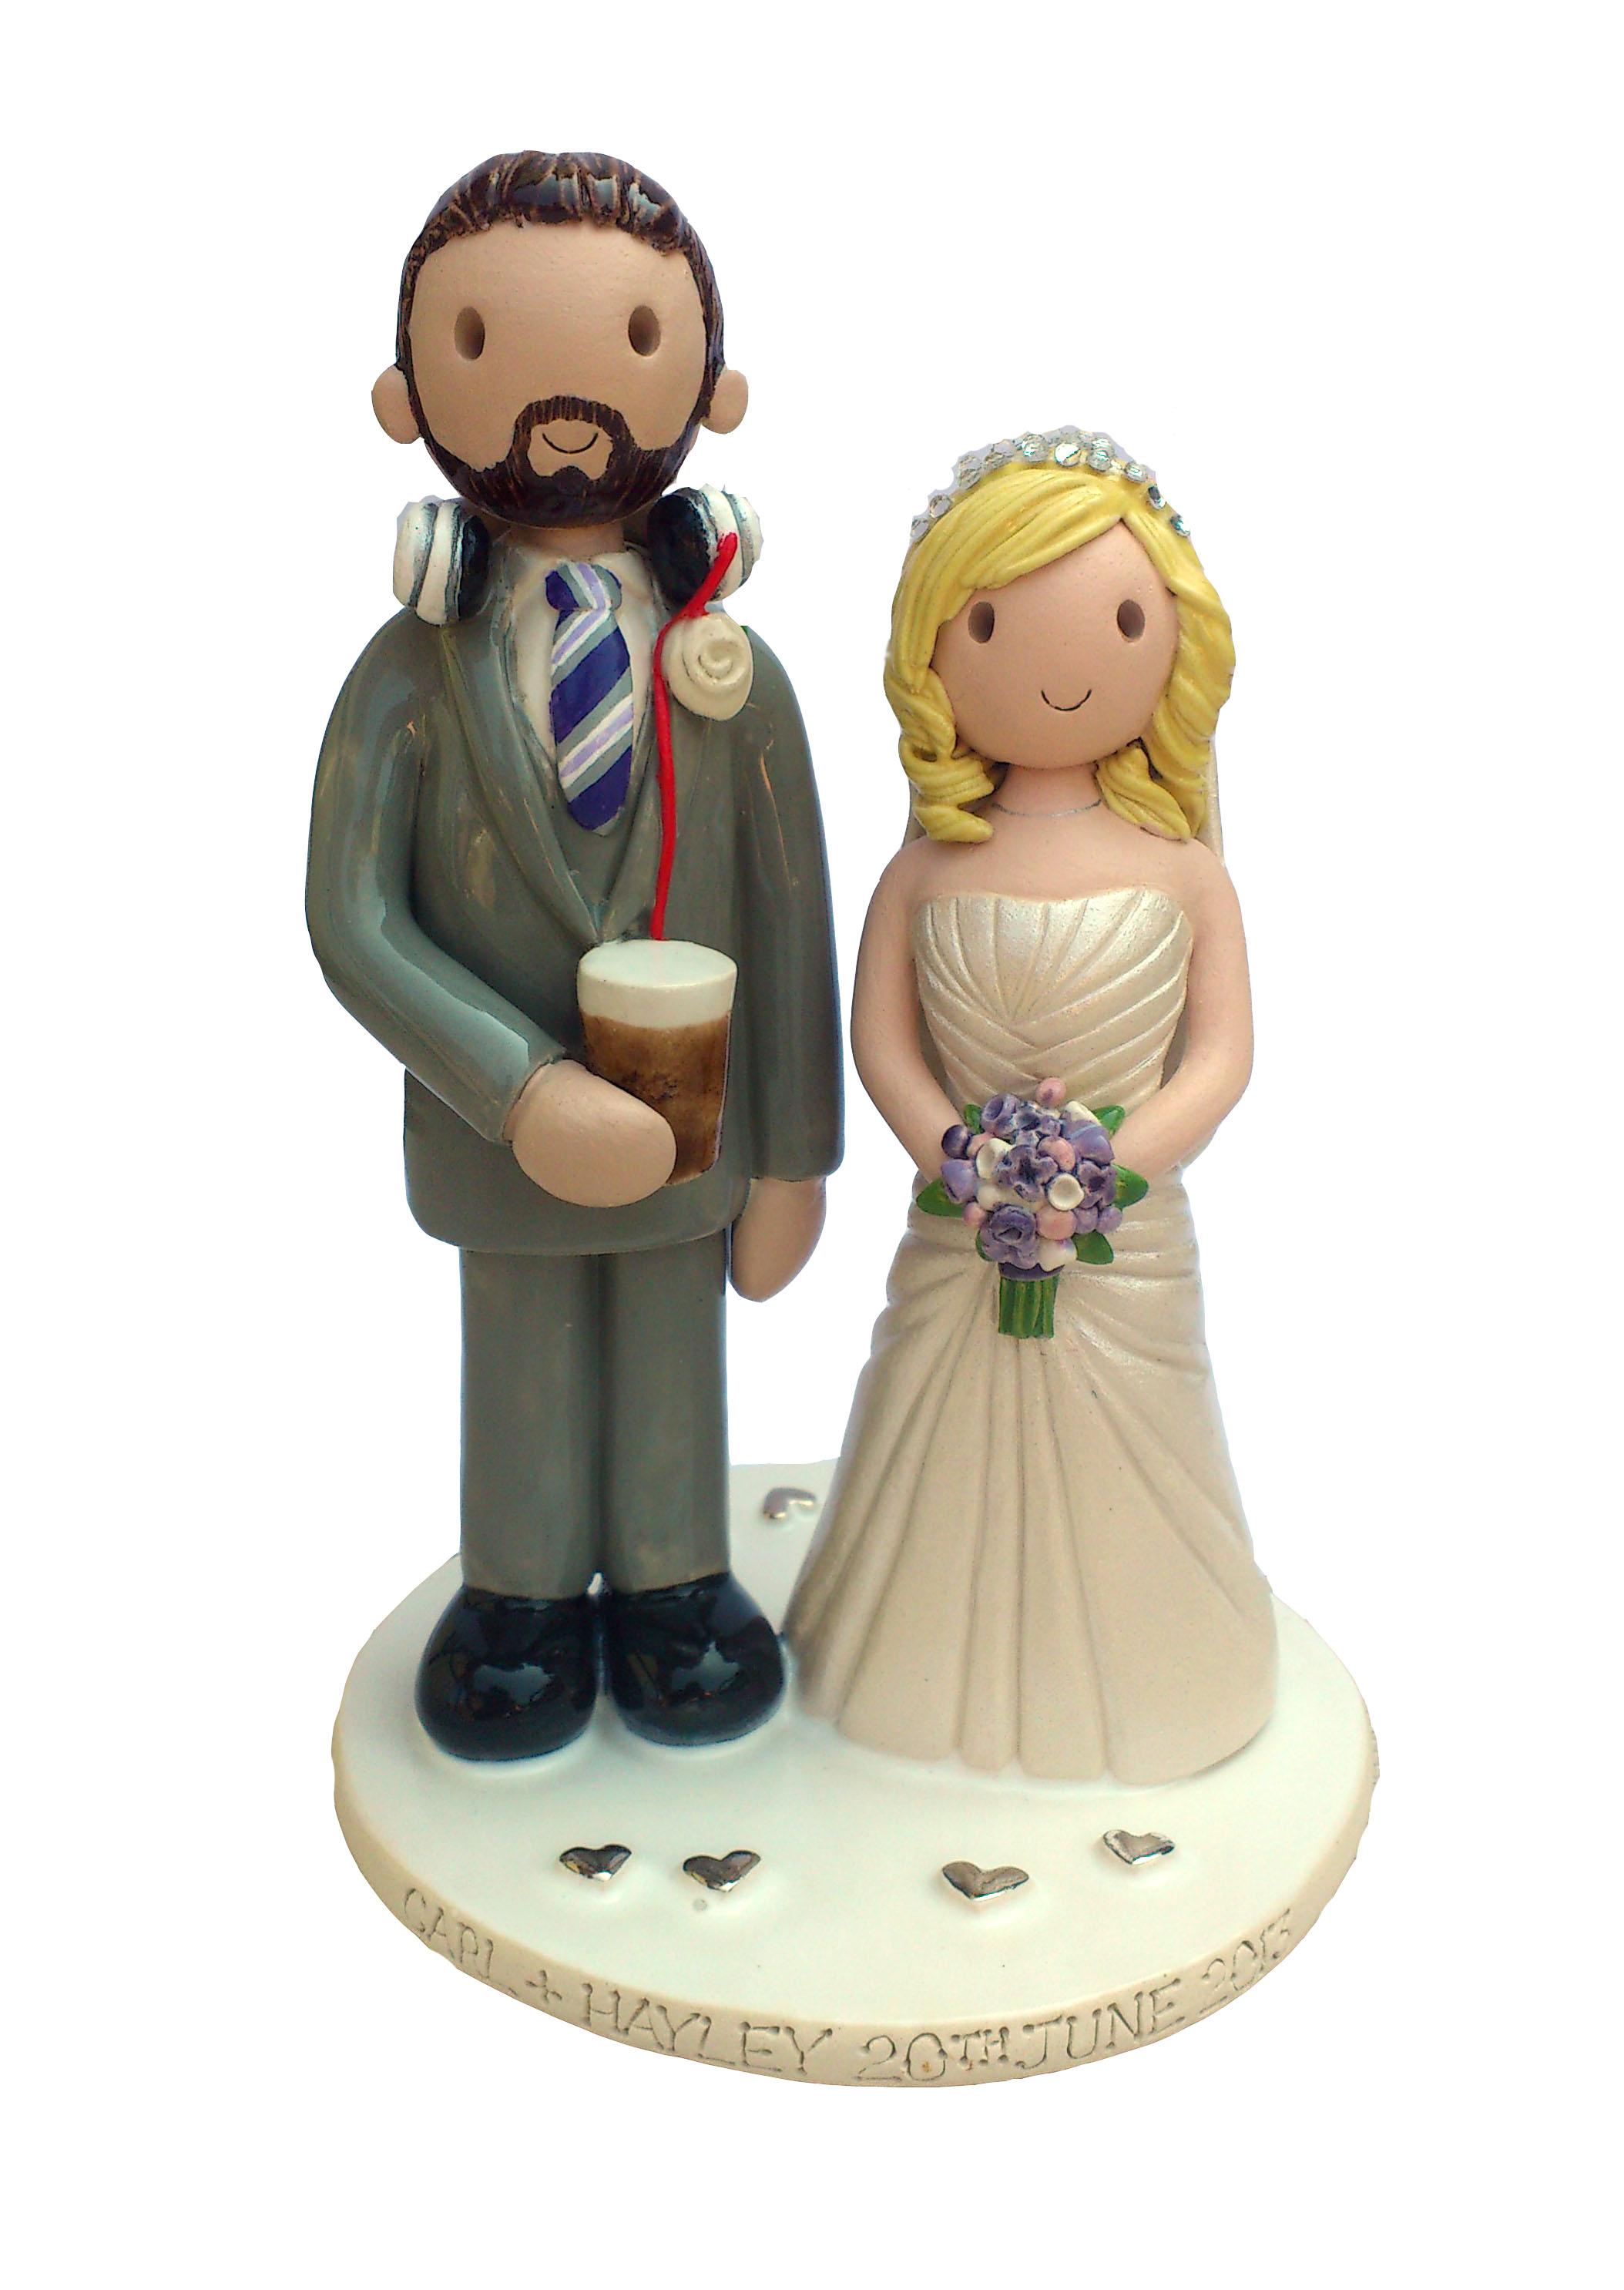 Wedding Cake Decorations Uk Only : DJ Wedding Topper